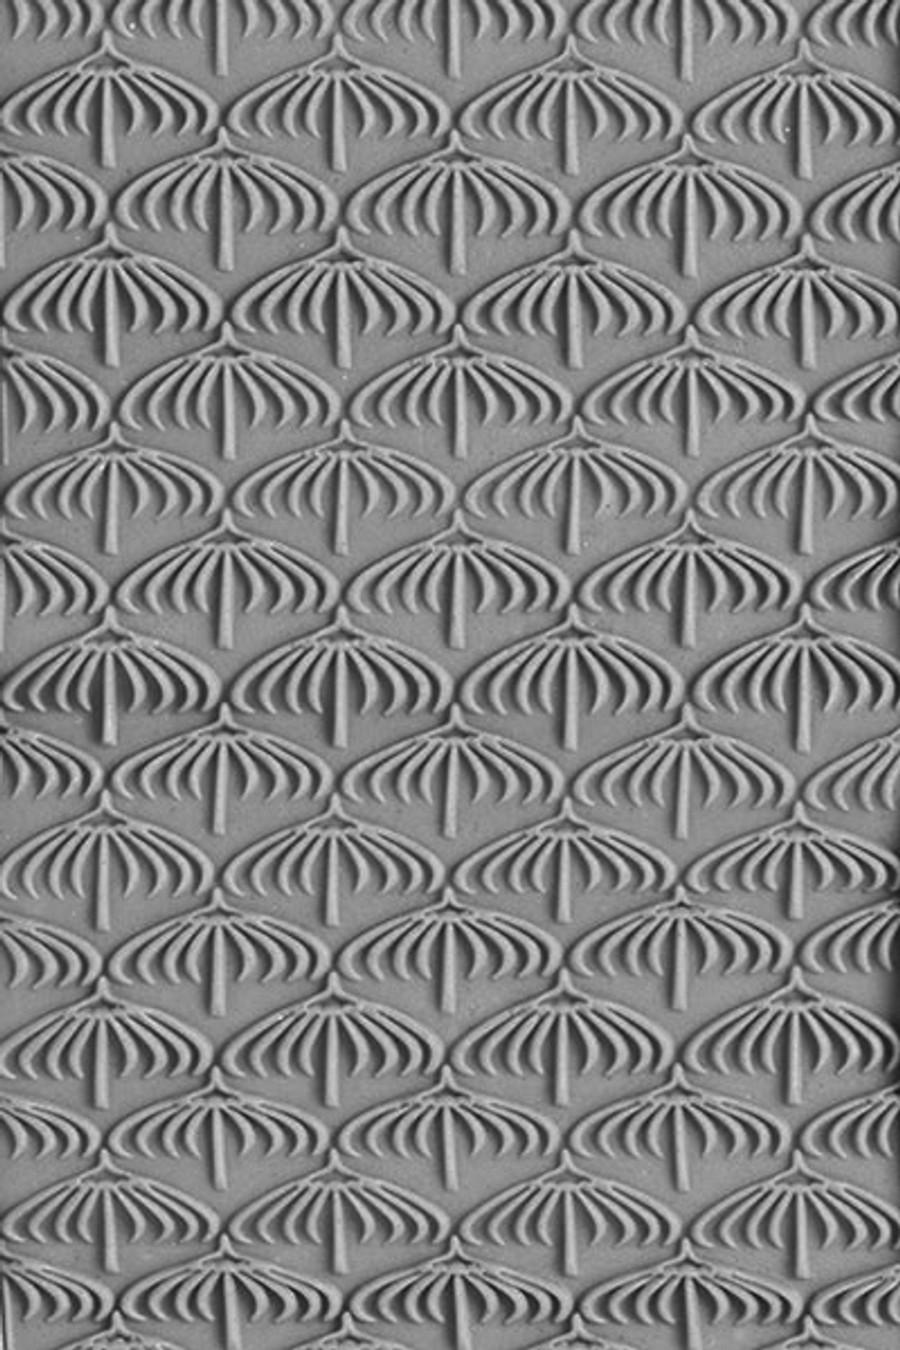 Large Acrylic Texture Roller - Umbrellas 7.5cm